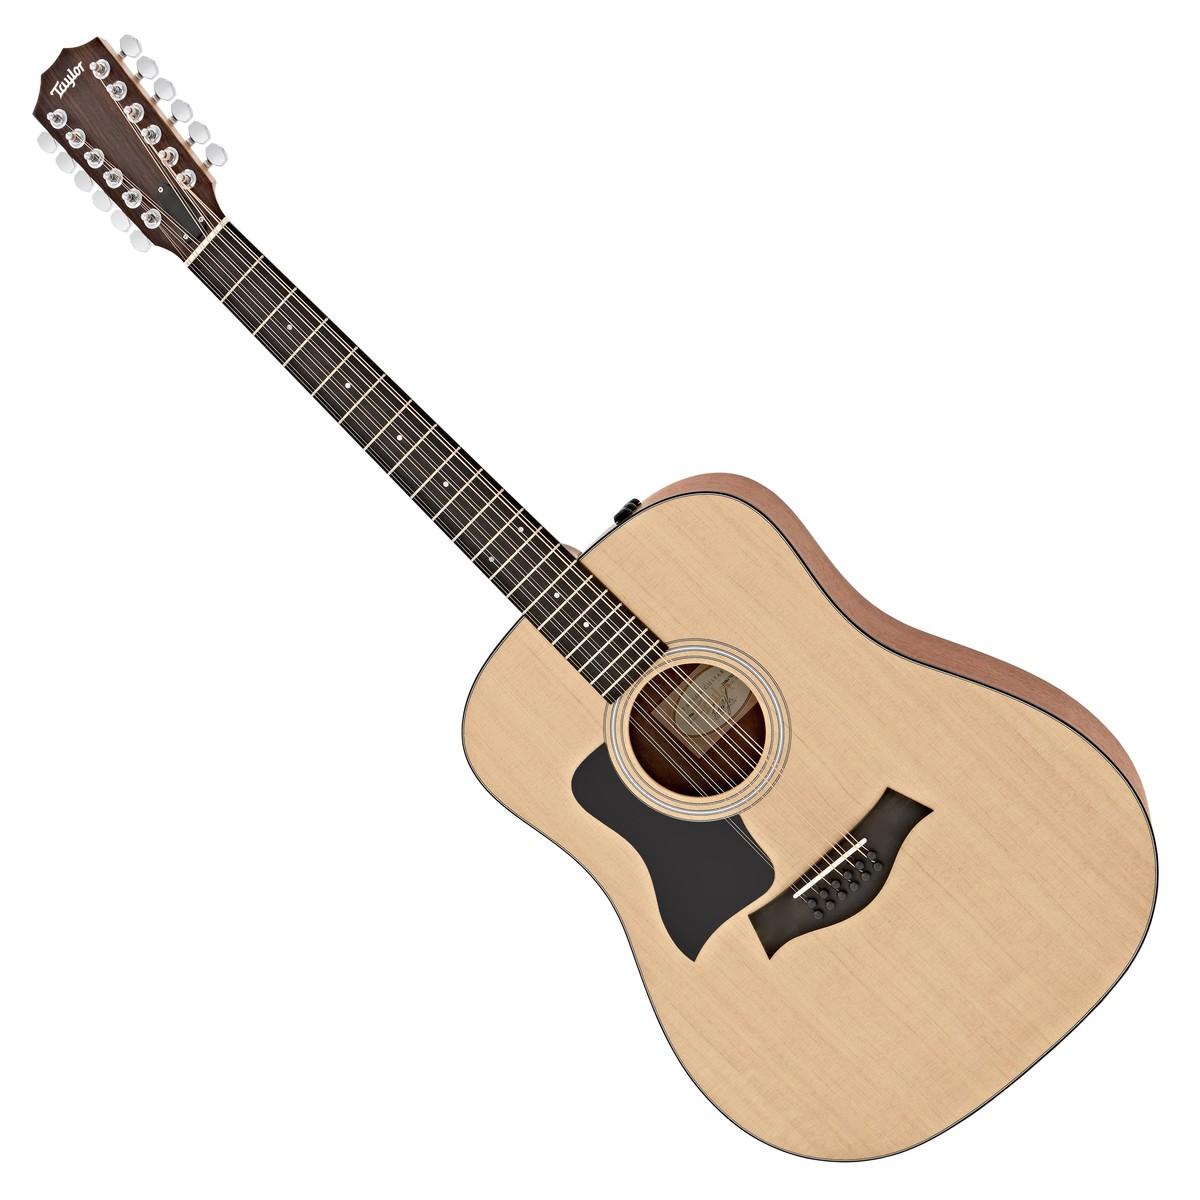 taylor 150e left handed 12 string dreadnought electro acoustic guitar at. Black Bedroom Furniture Sets. Home Design Ideas